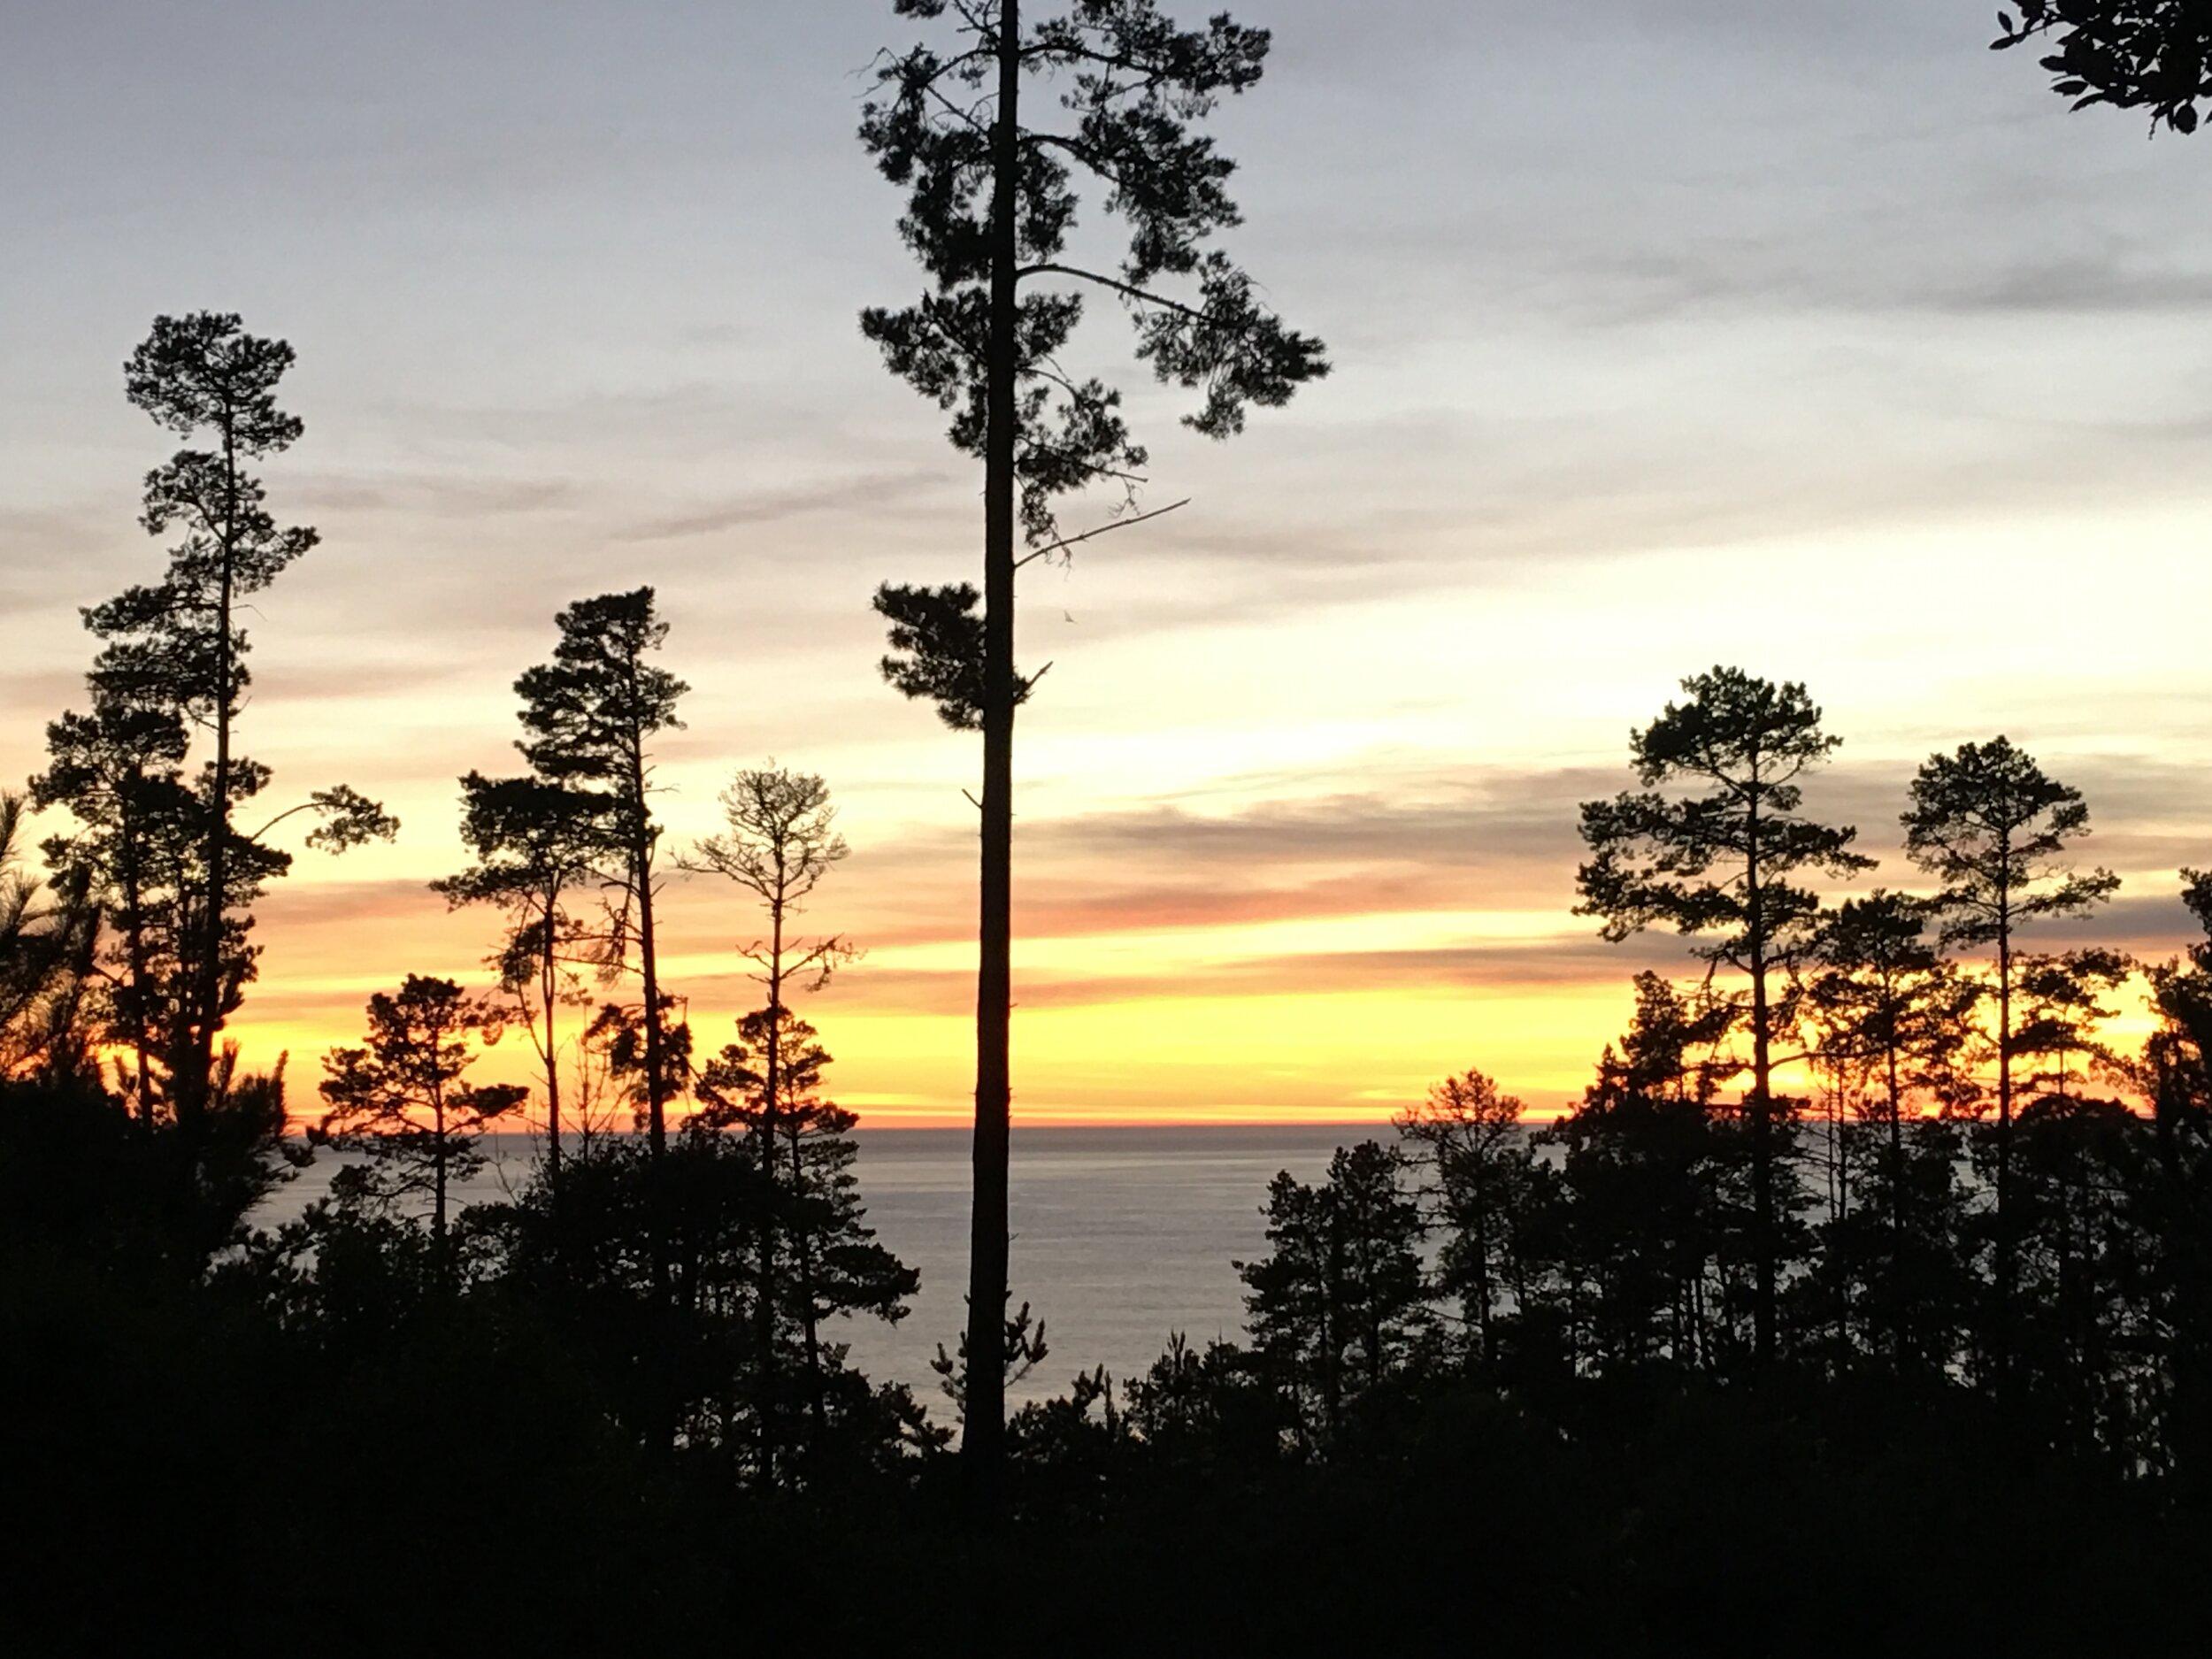 songwriting camp sunset.jpg